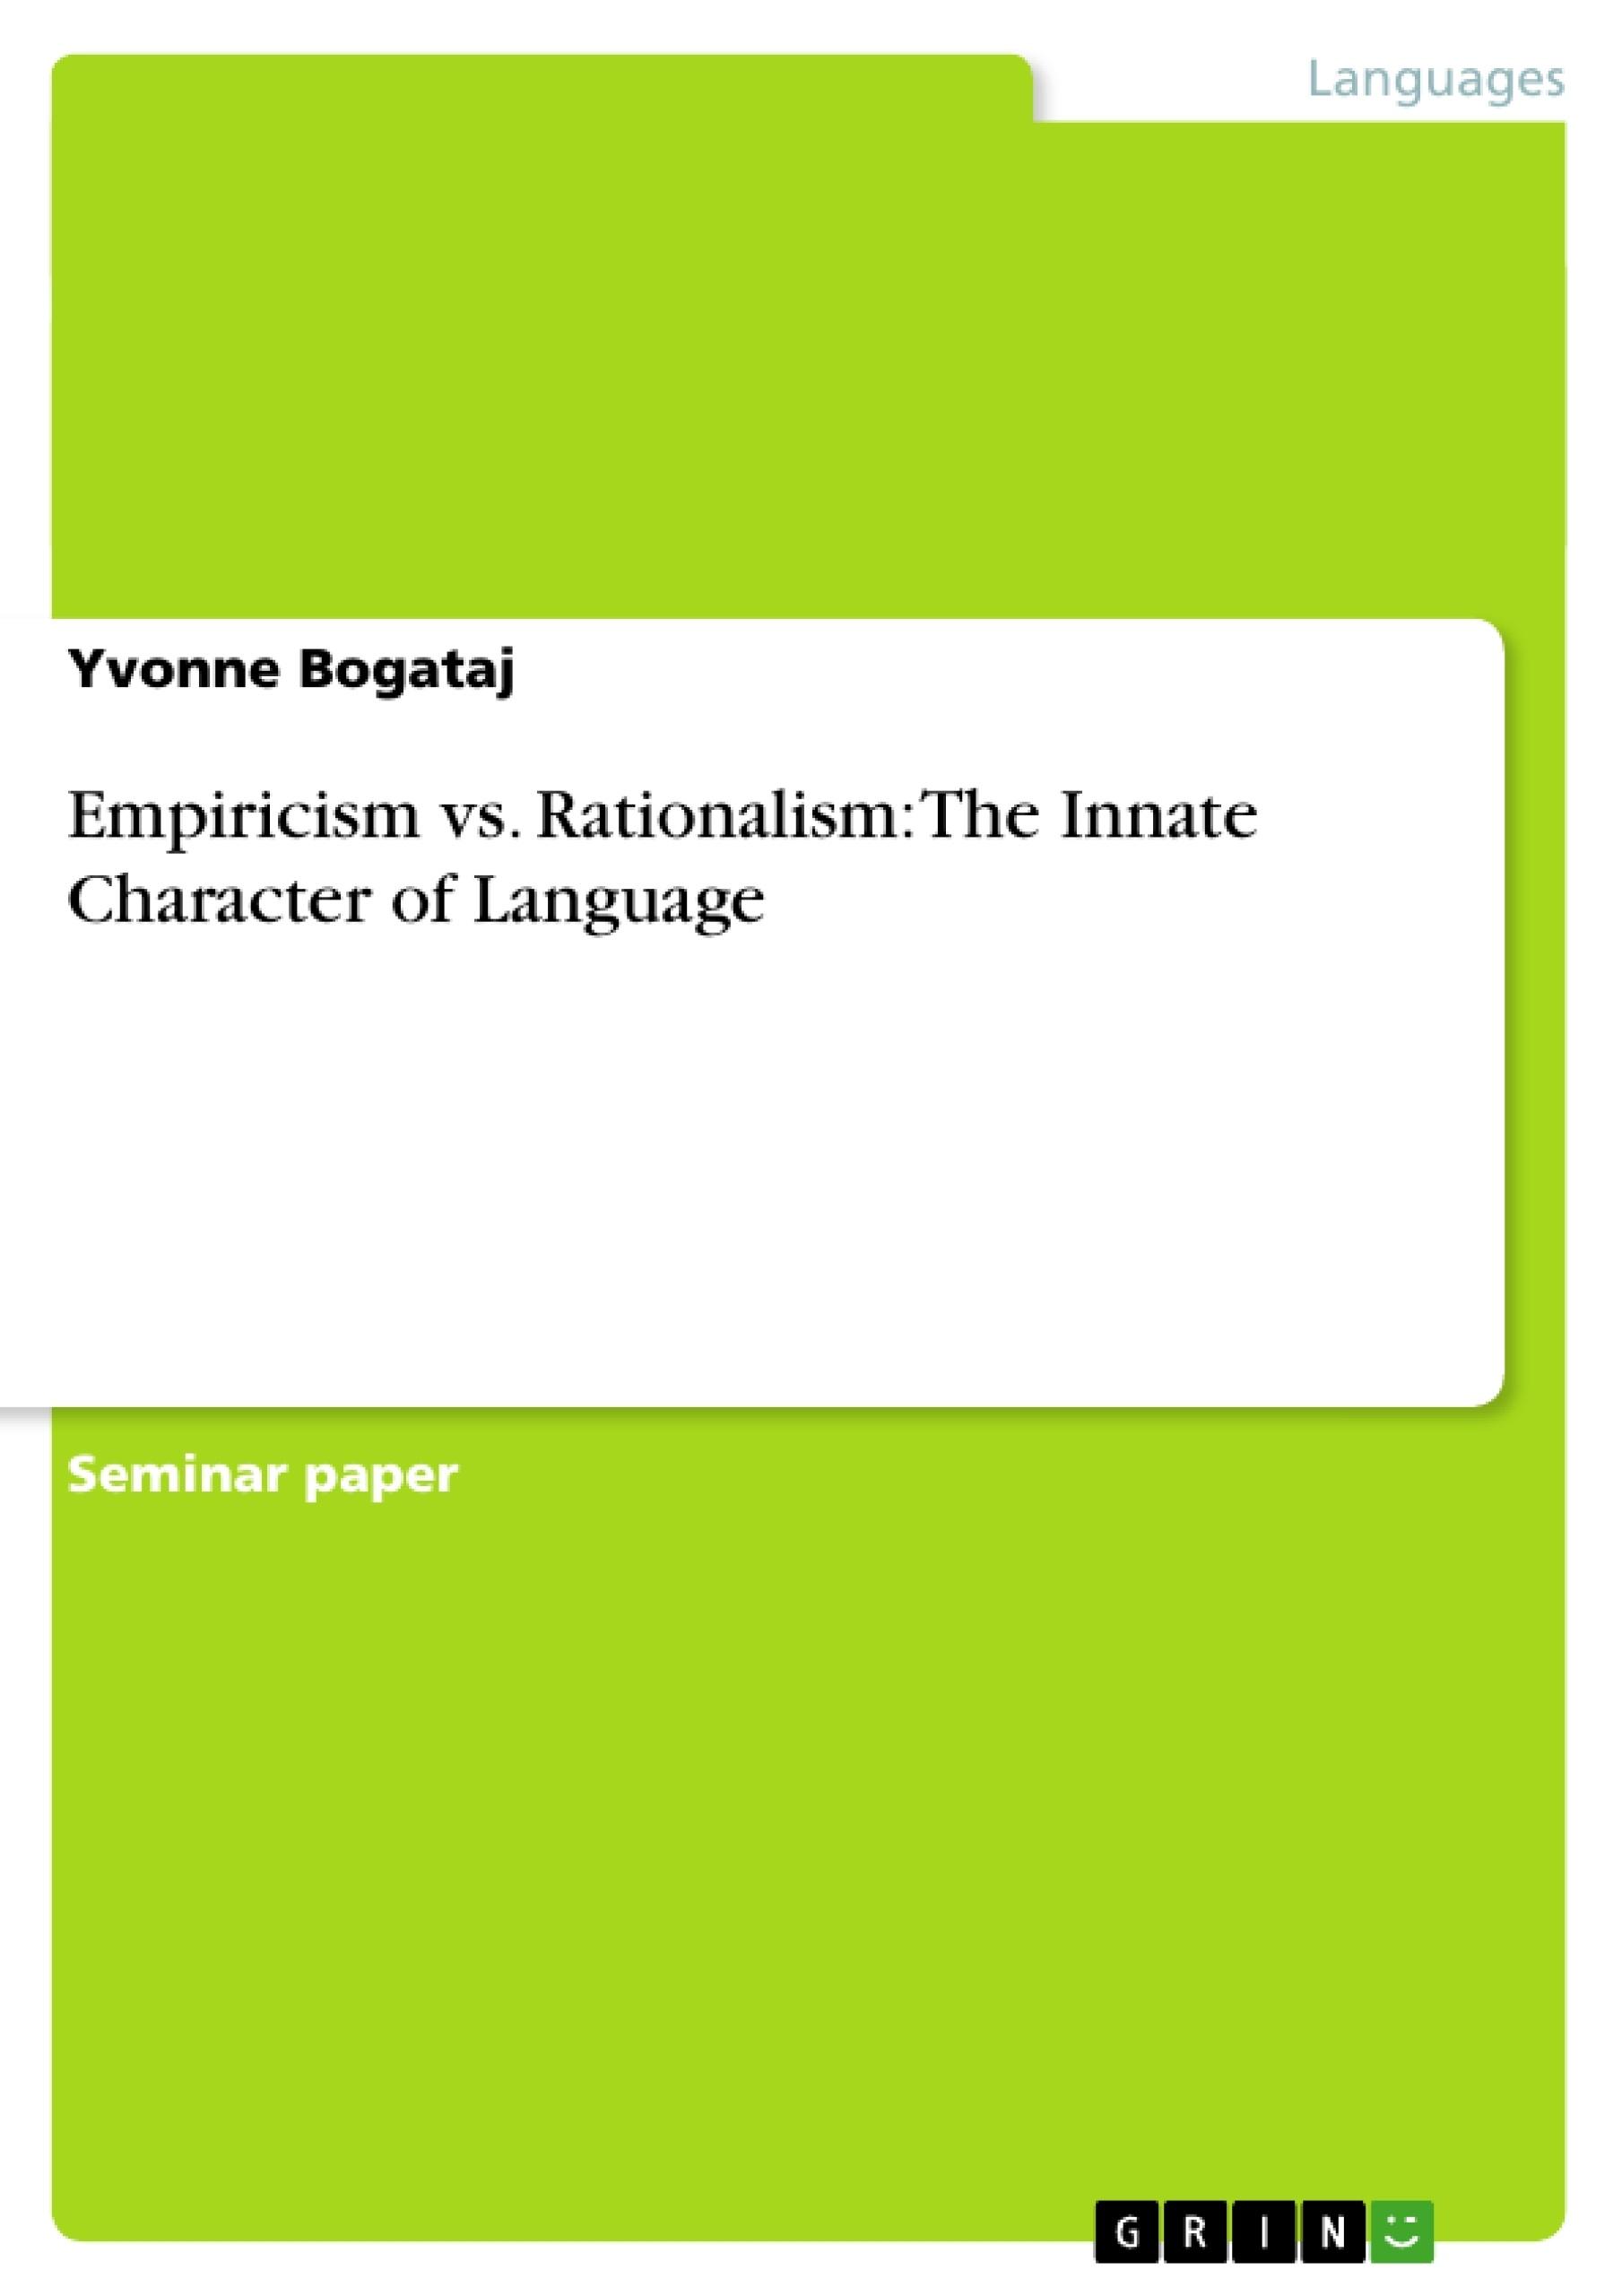 Empiricism Vs Rationalism The Innate Character Of Language